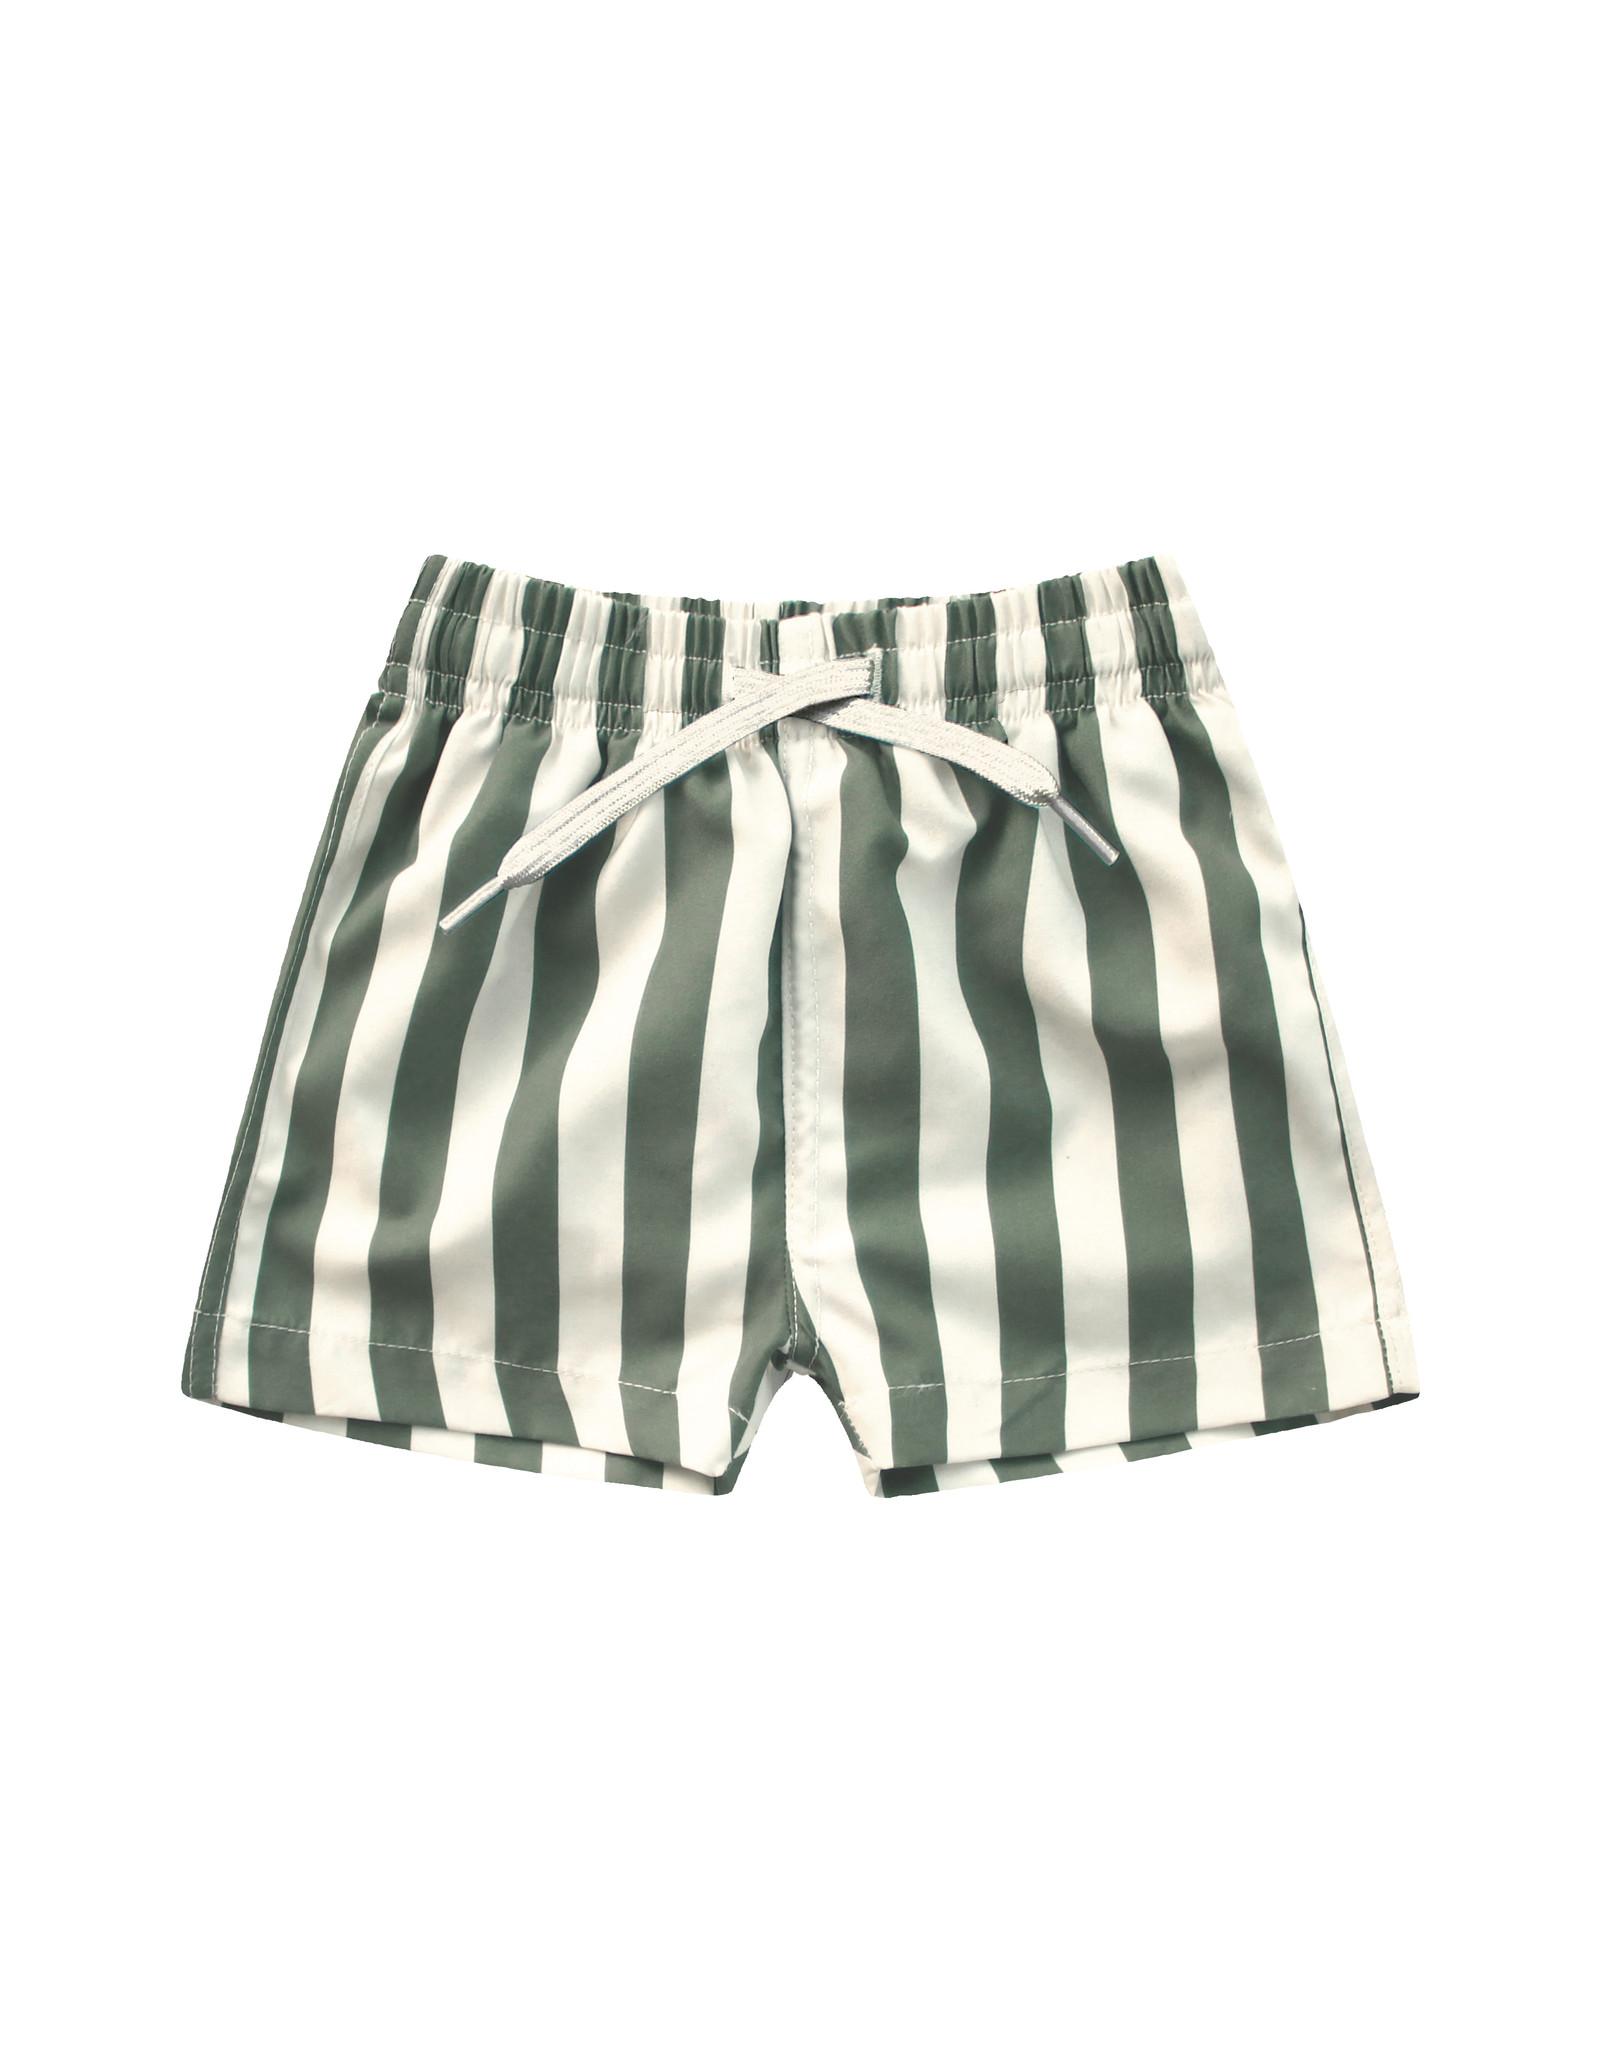 Your Wishes Bold Stripes   Swim Shorts